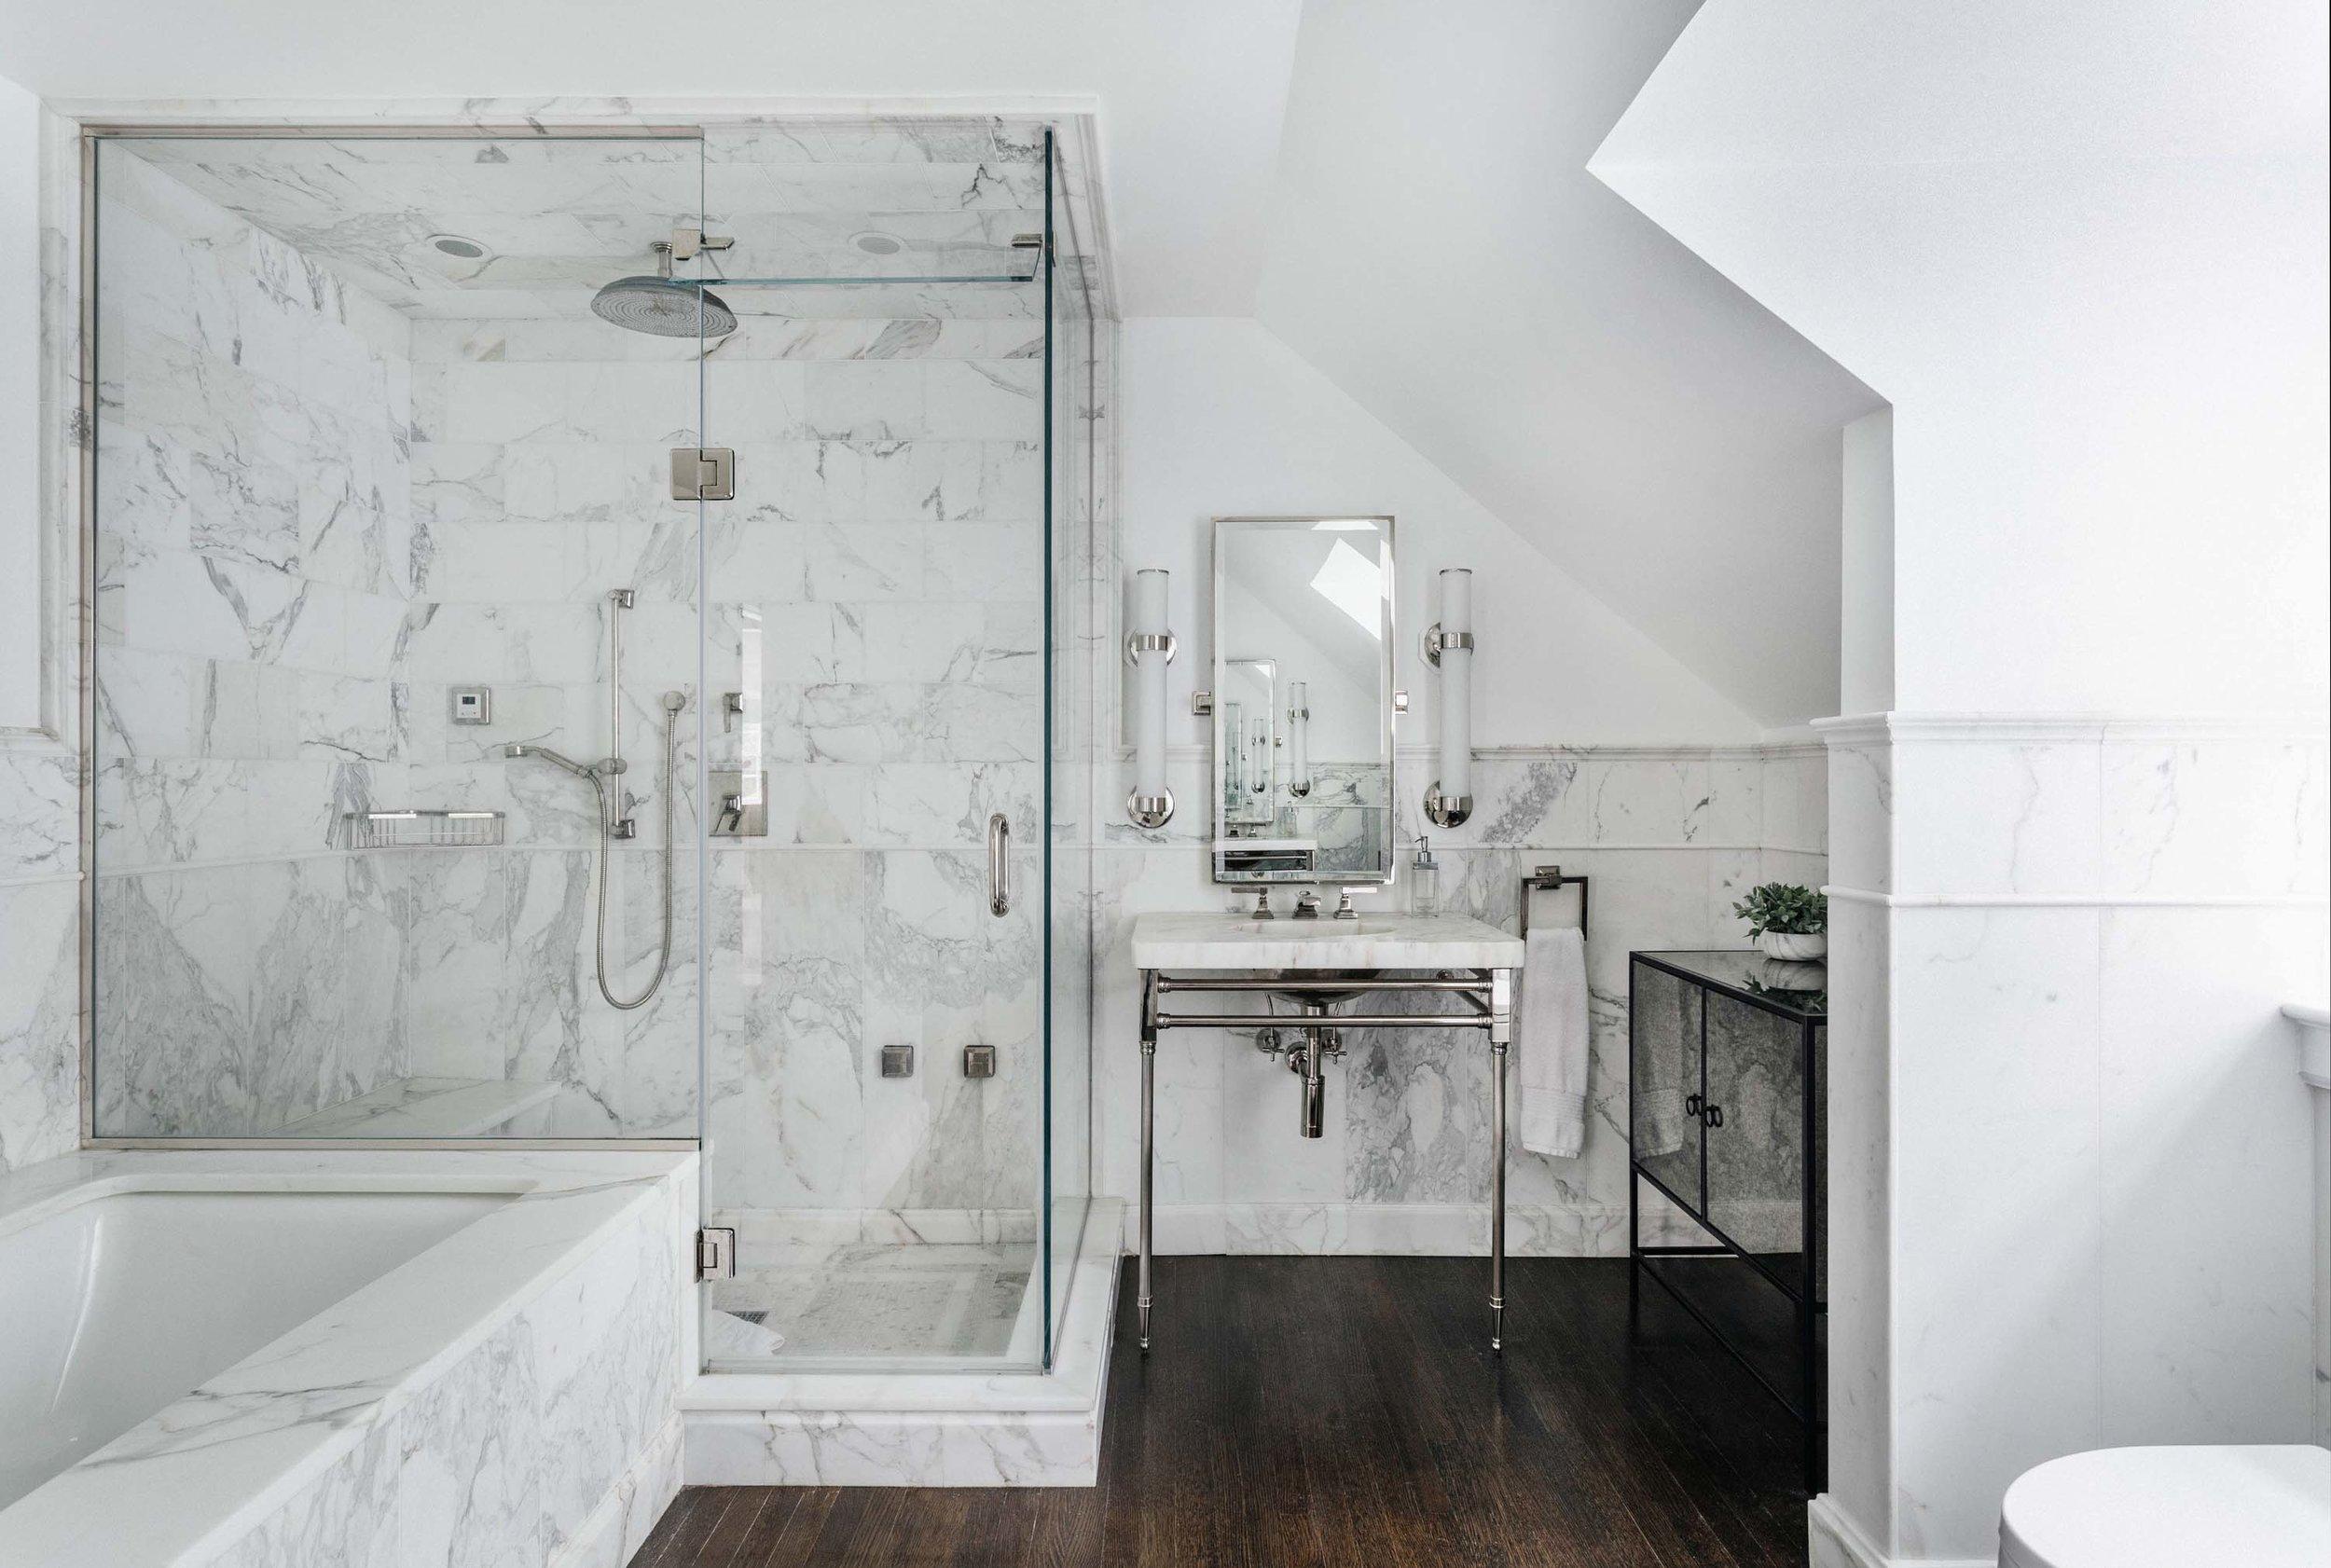 Bathroom with shower cubicle, bathtub and hardwood floor